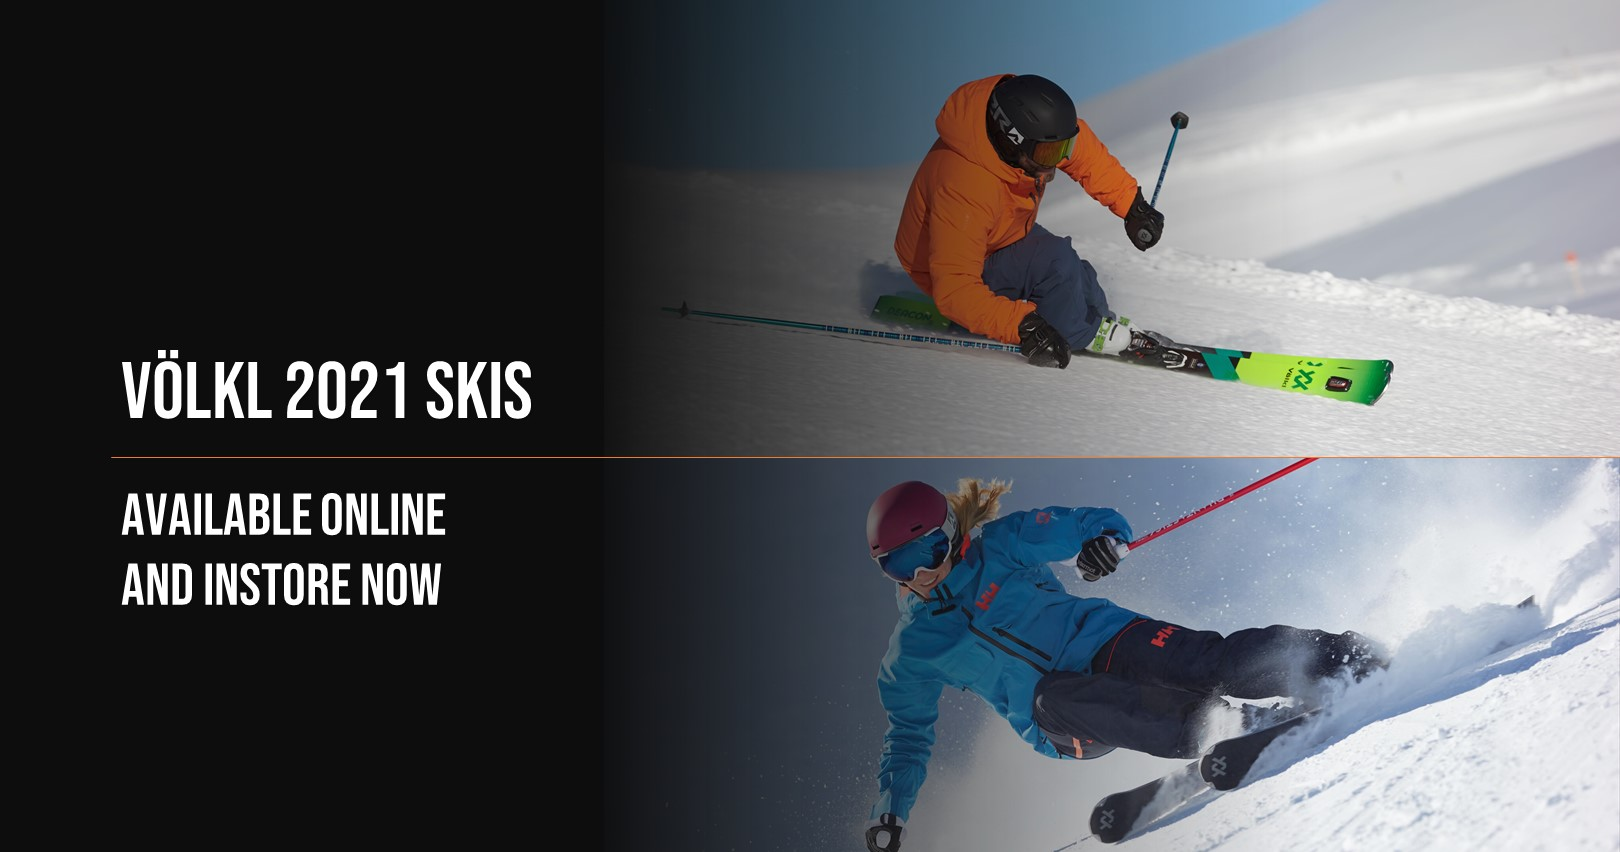 Volkl 2021 Ski